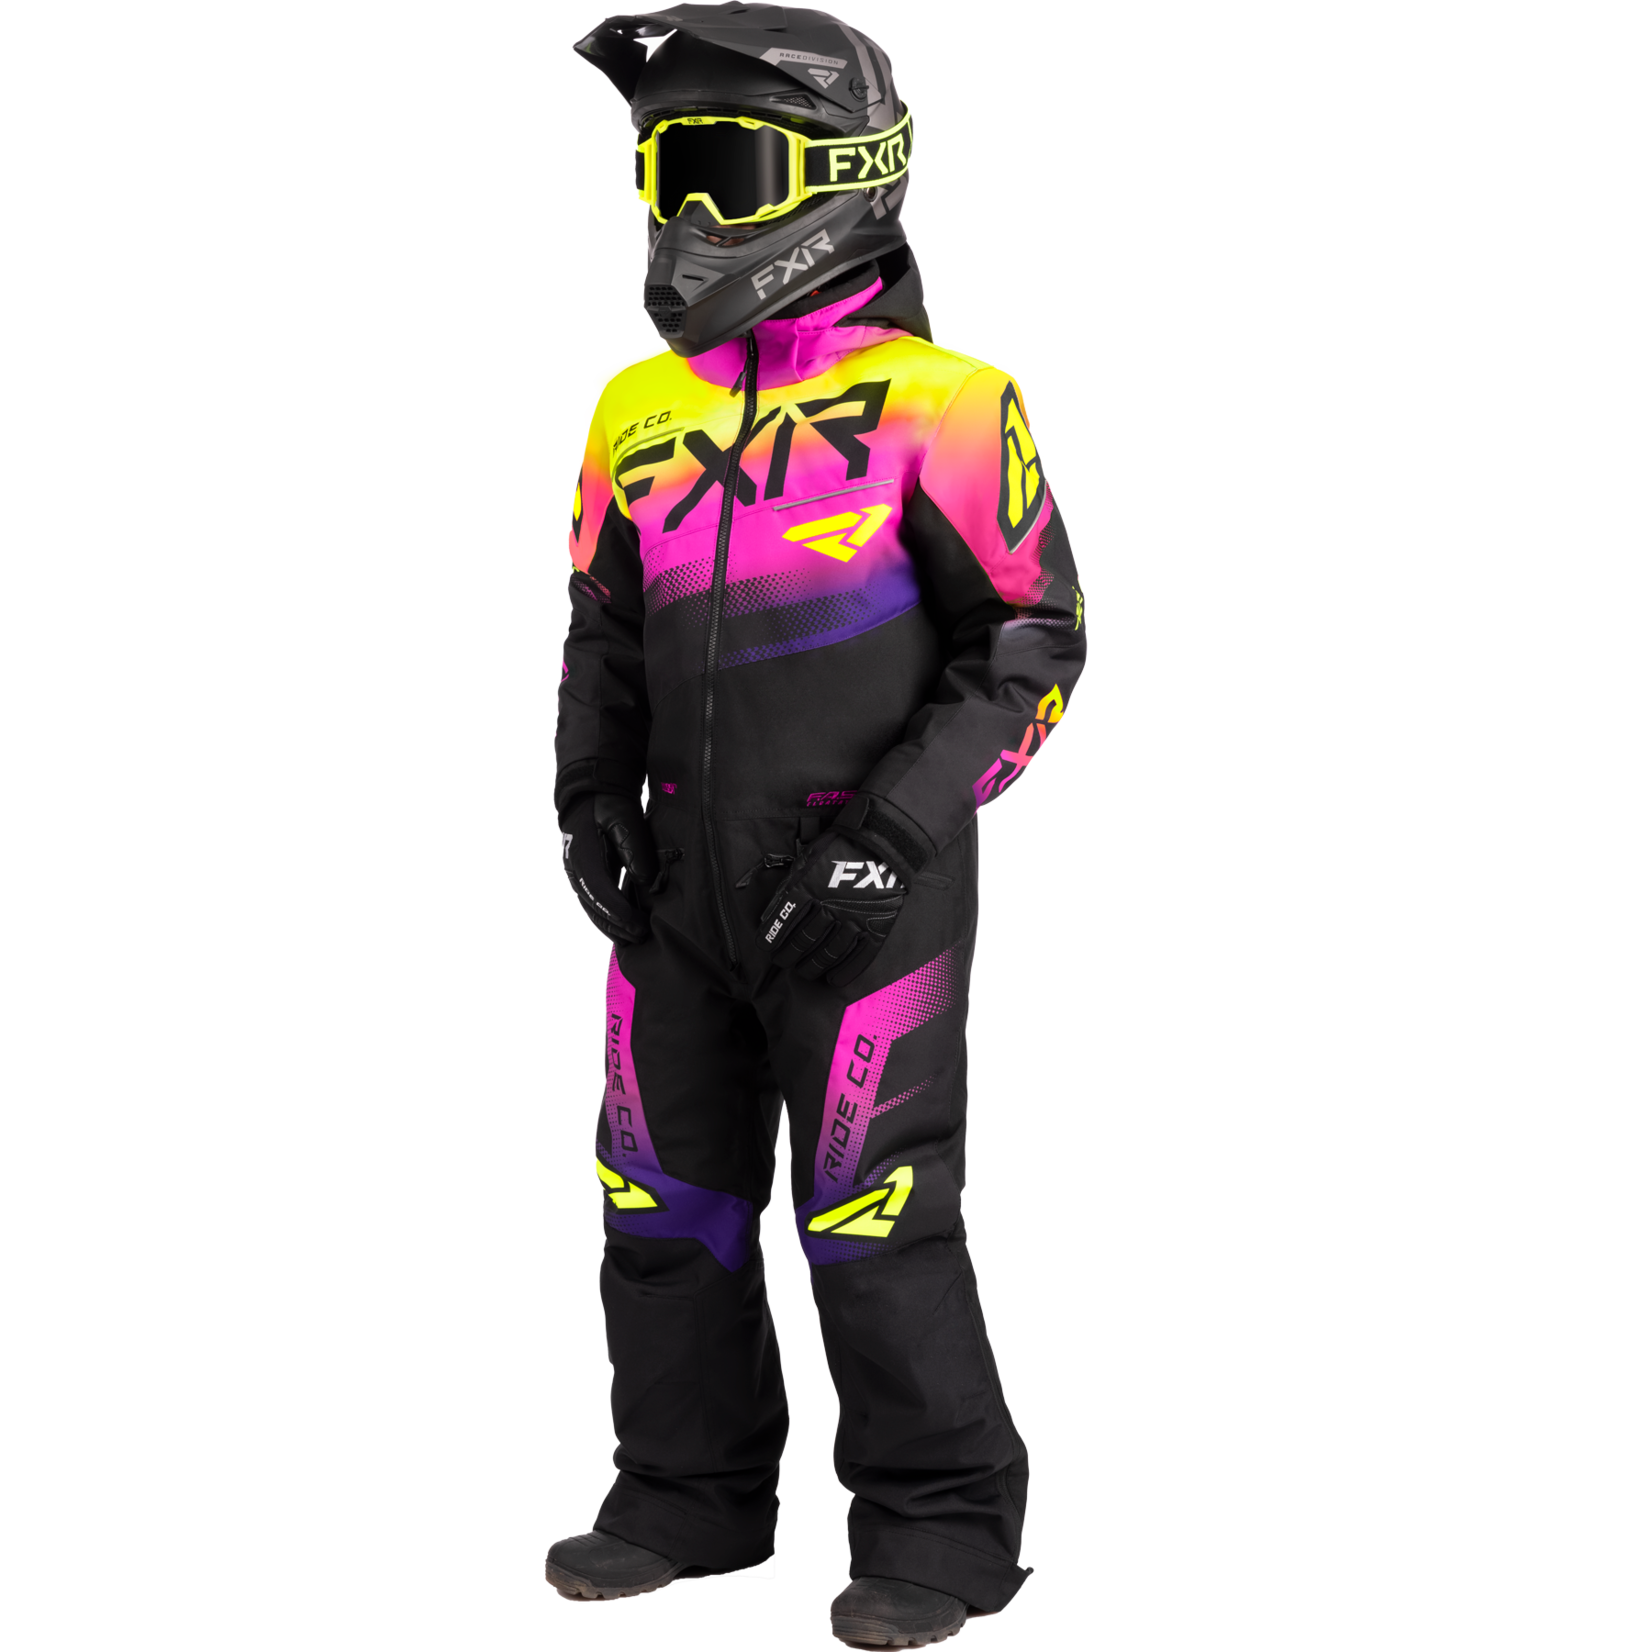 FXR FXR Youth Boost Monosuit Black/Neon Fusion